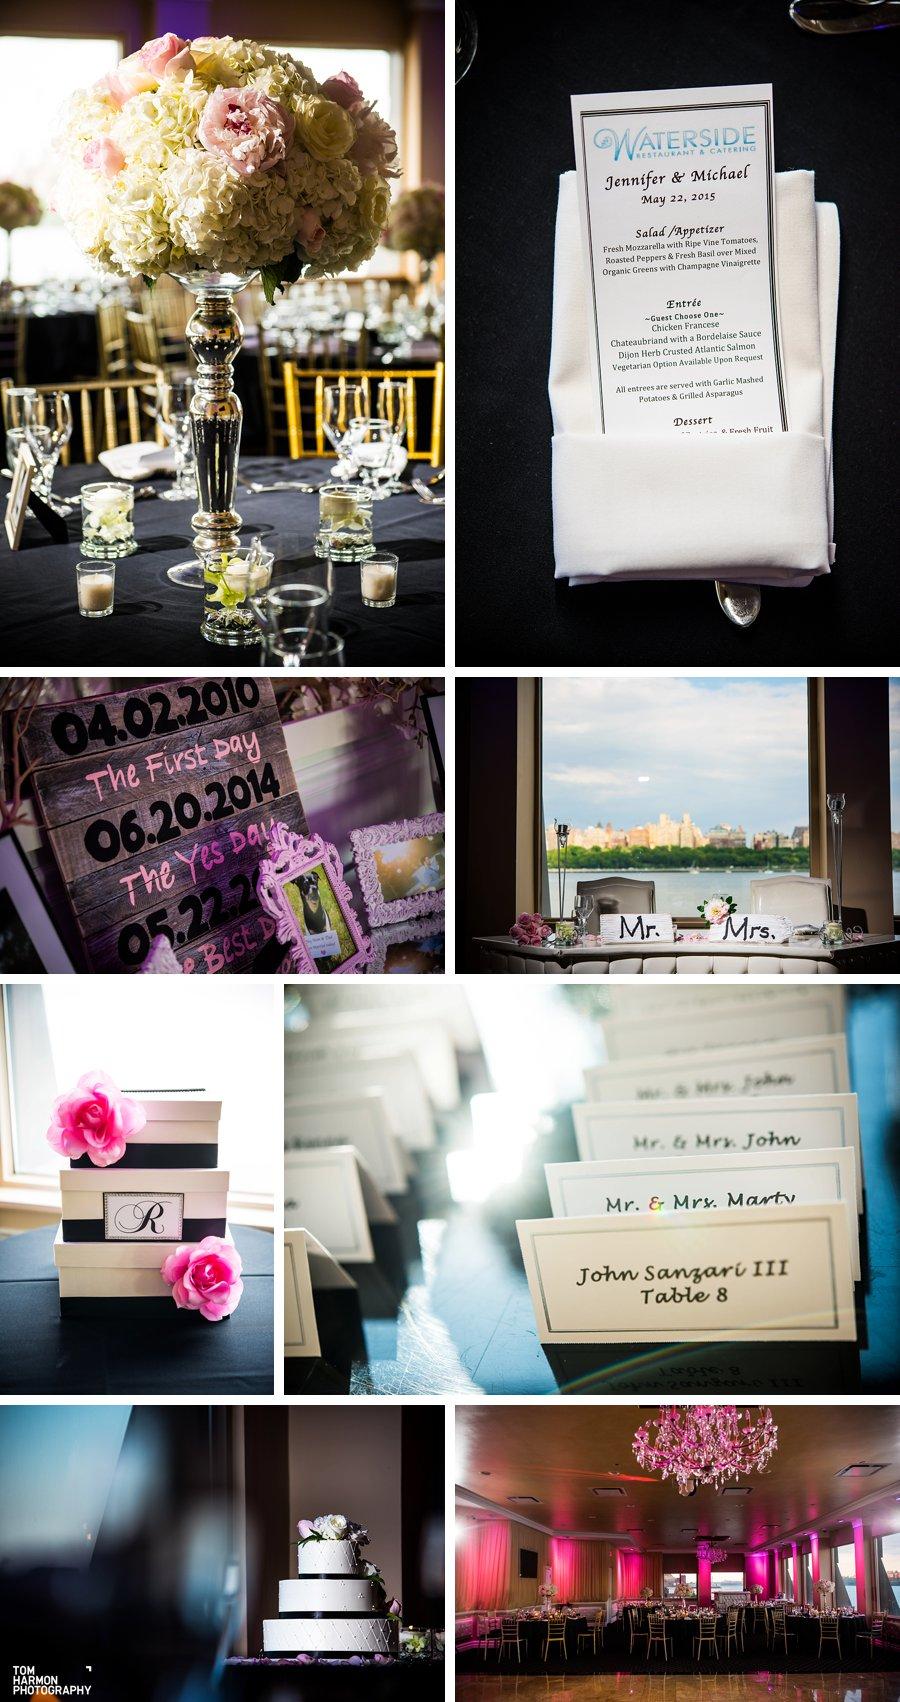 Waterside_Restaurant_Wedding_0032